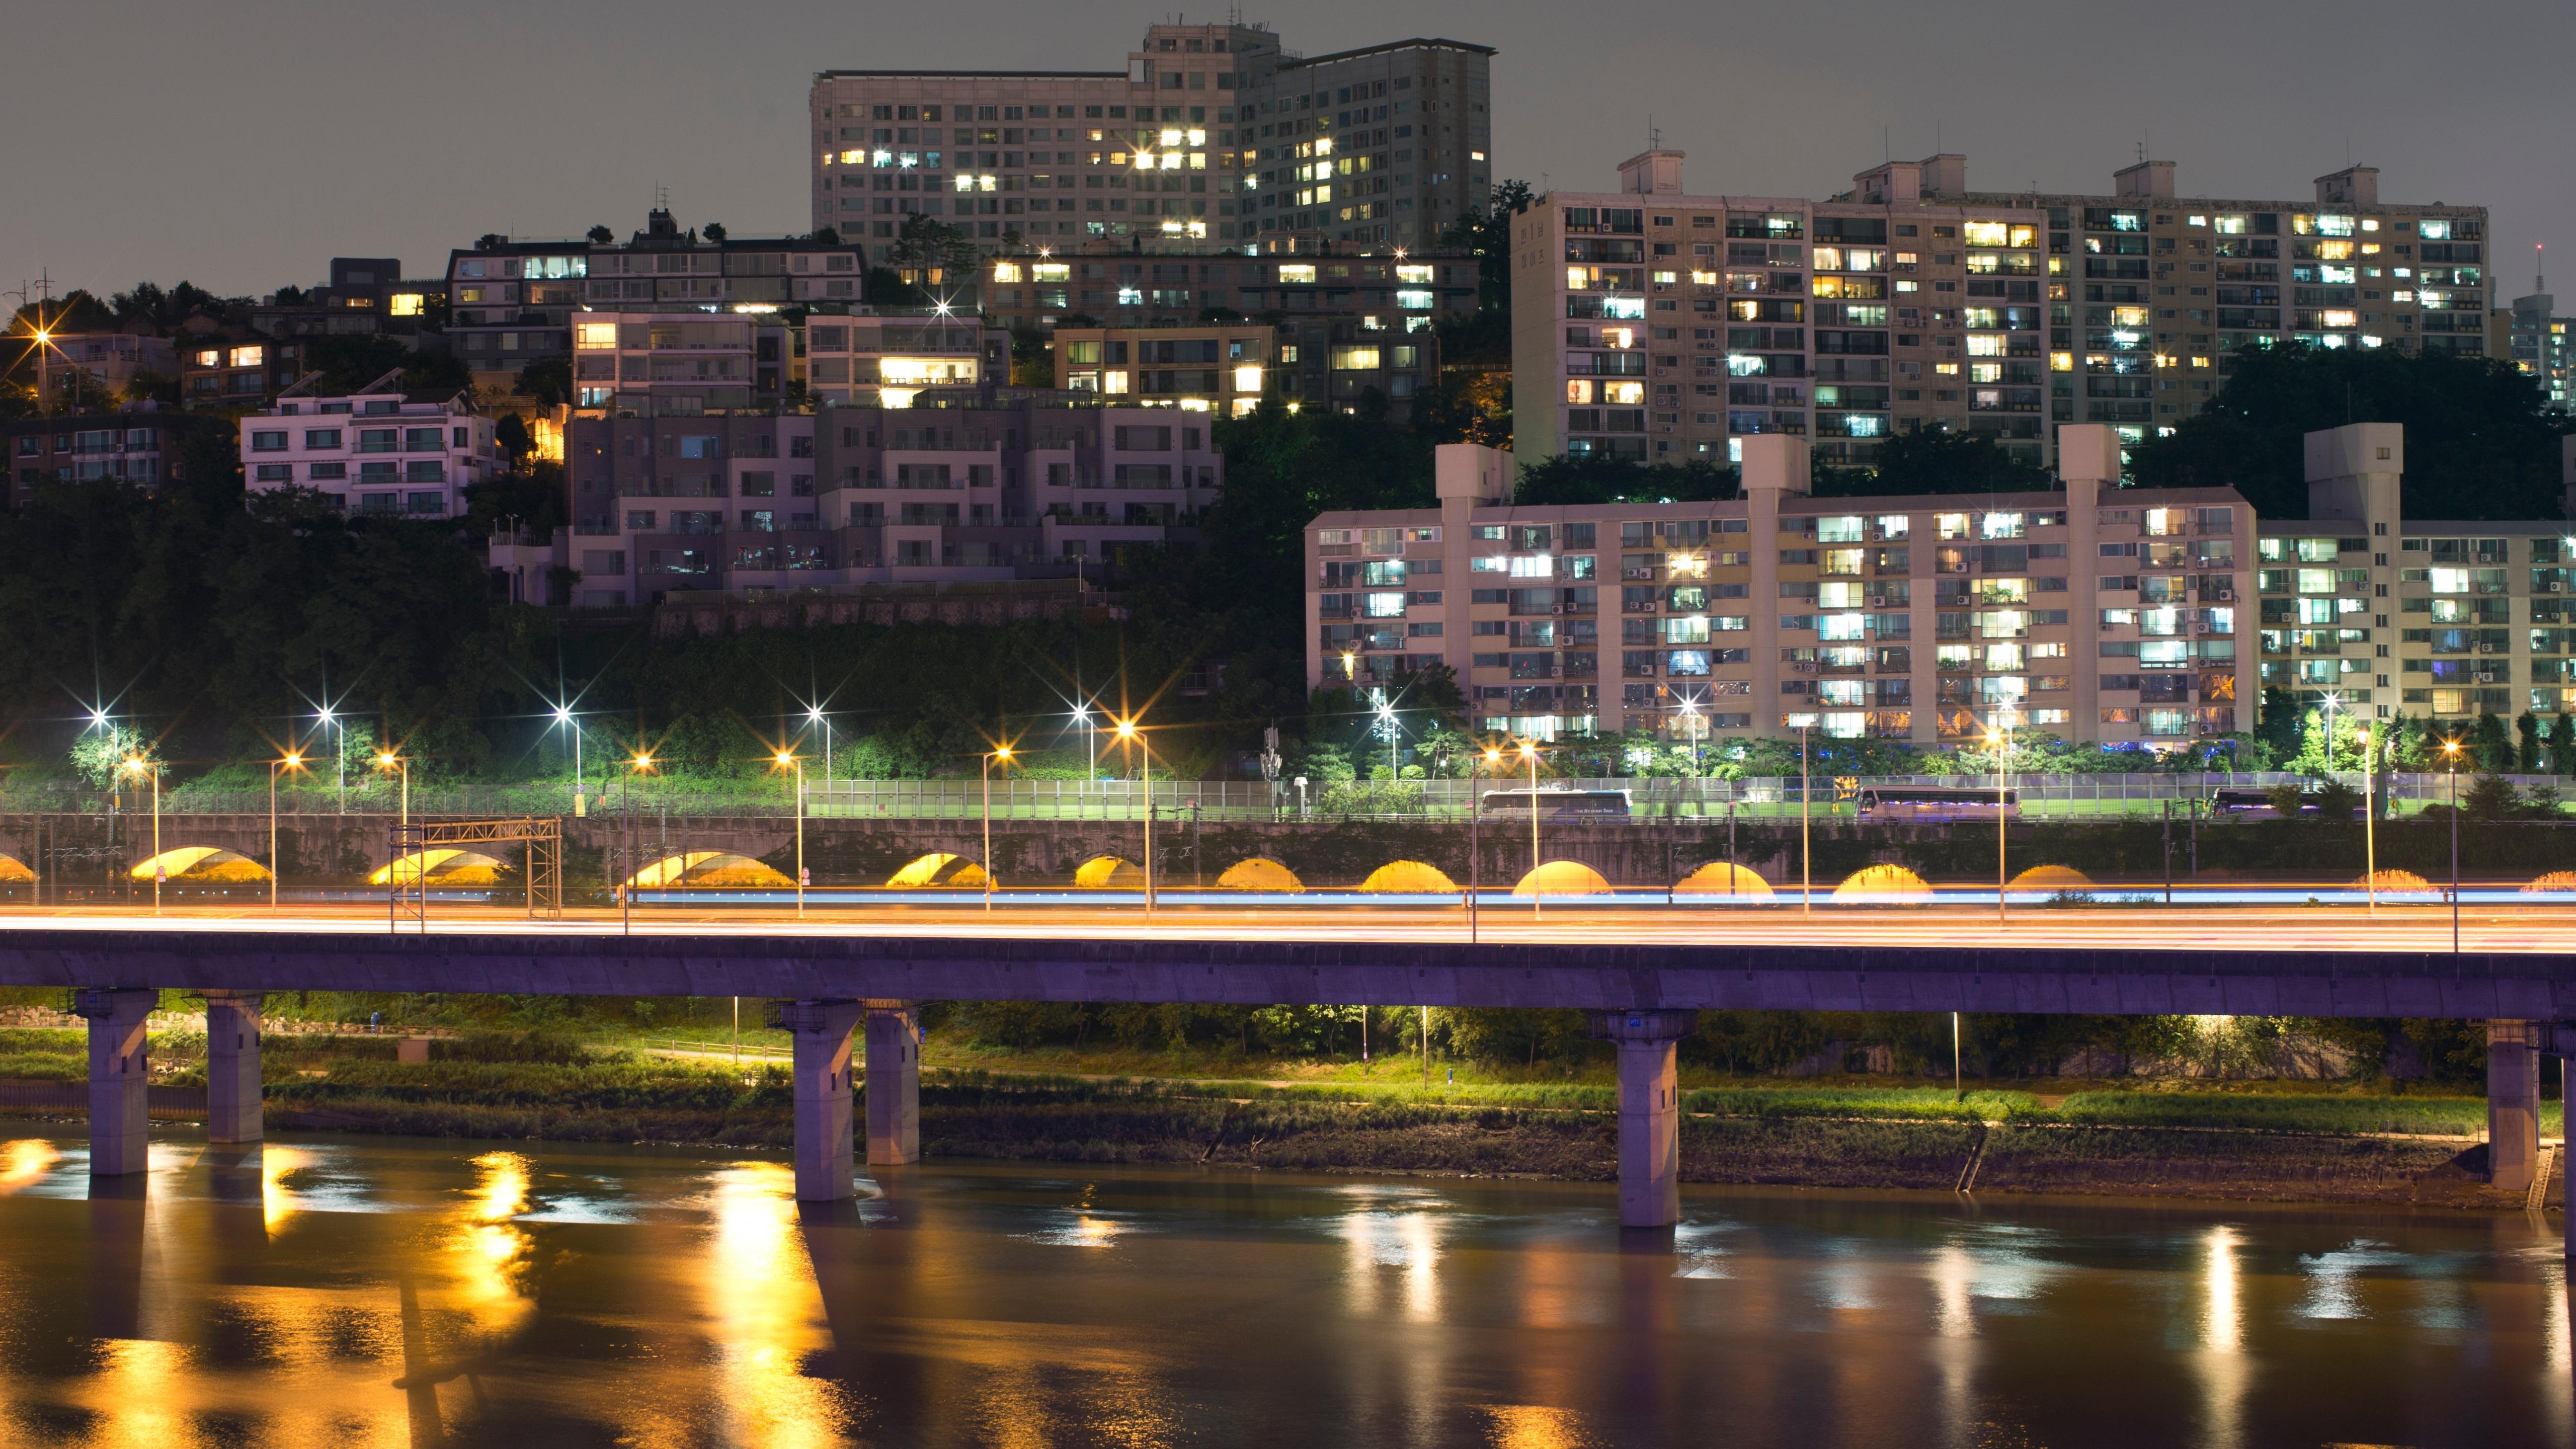 Riverside Expressway & the Han River wallpaper